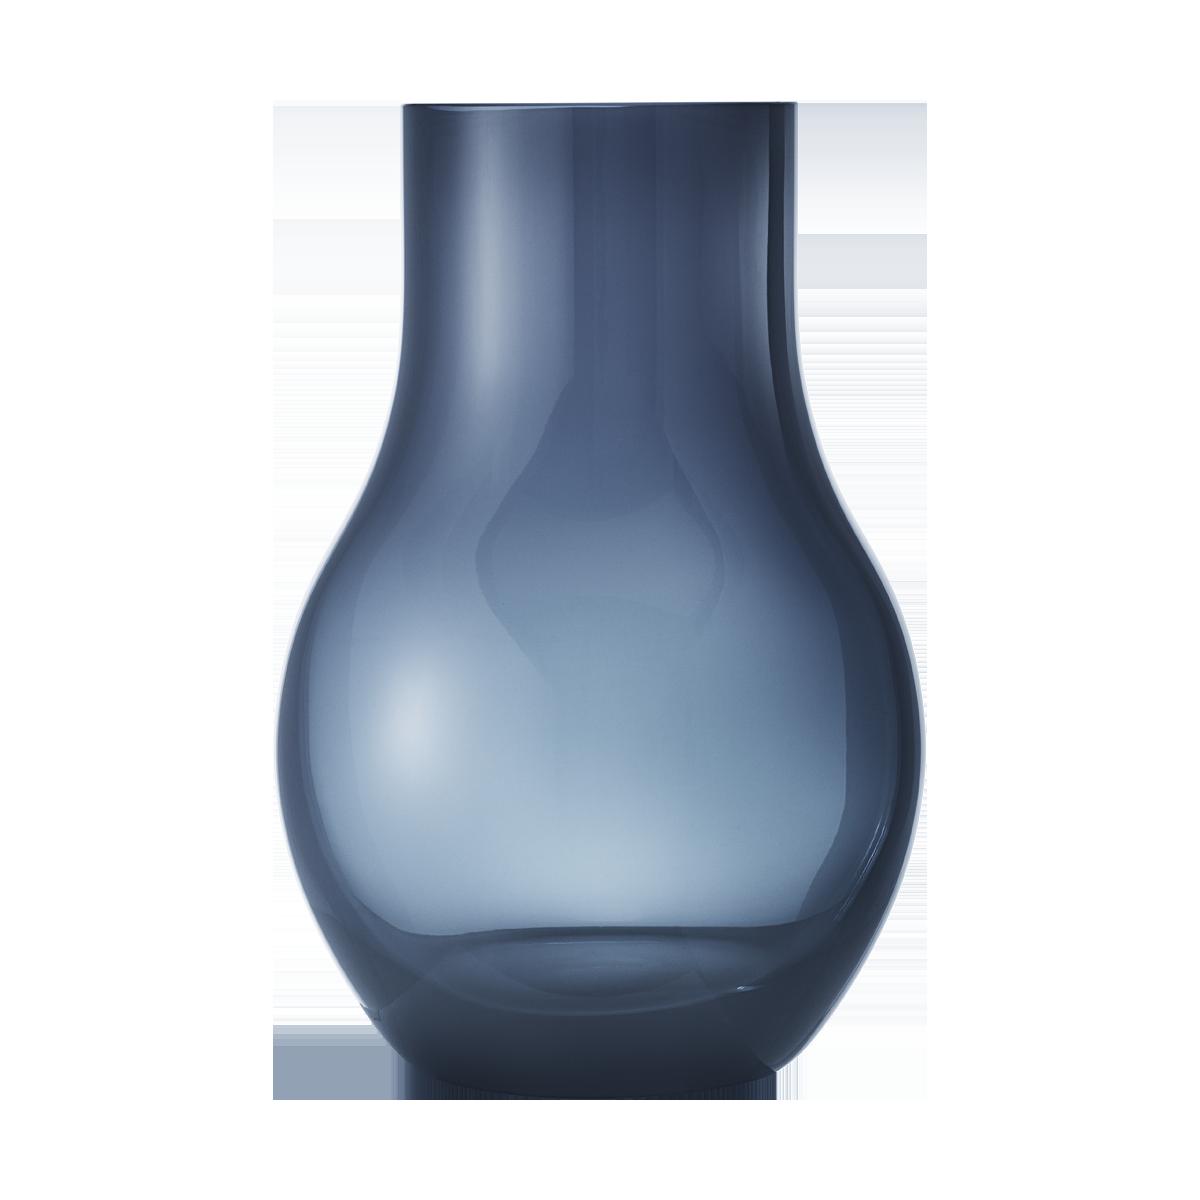 Cafu Modern Vase Handmade In Heavy Blue Glass Georg Jensen